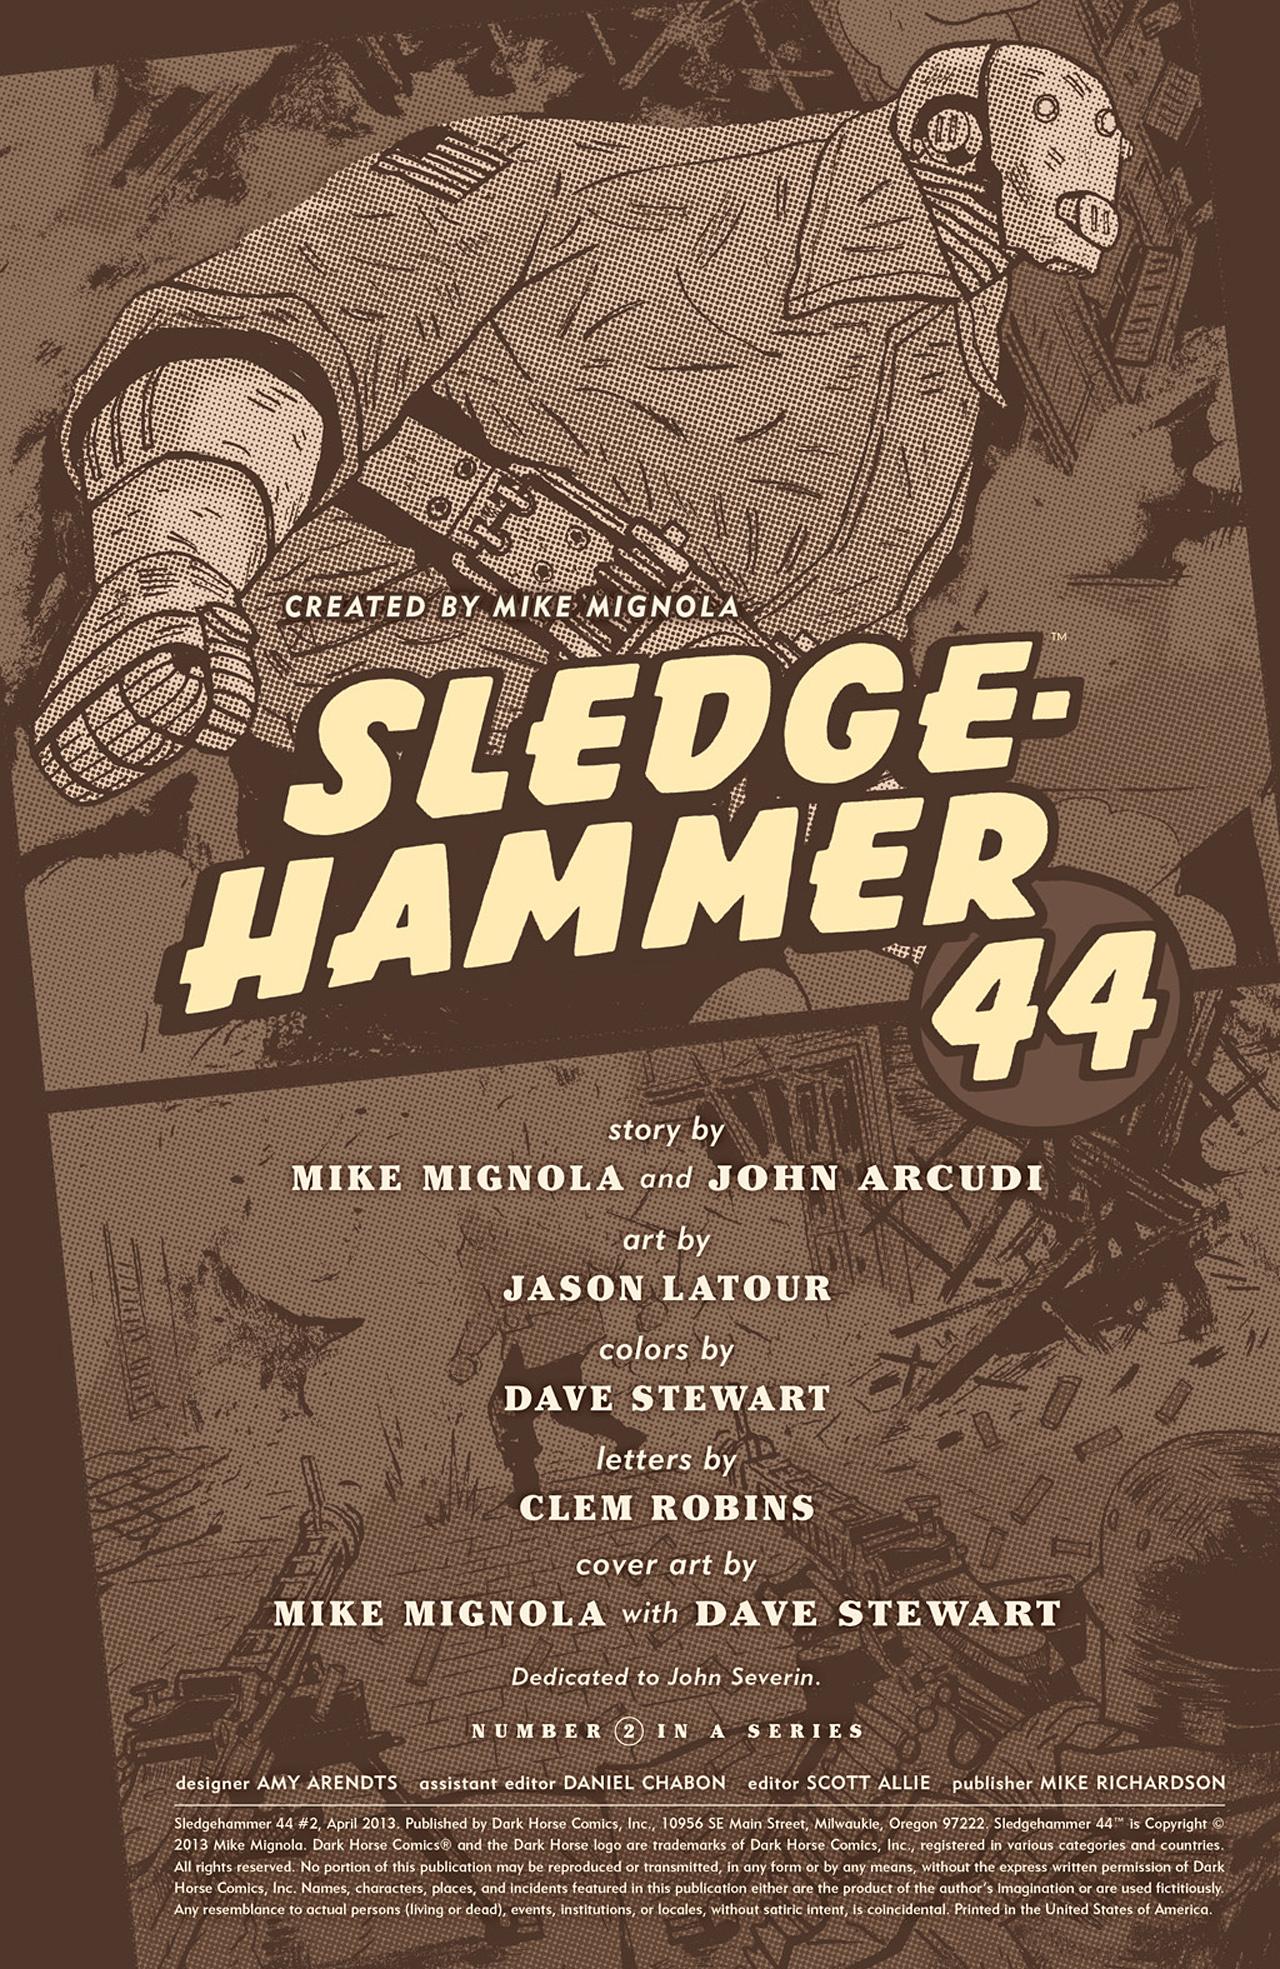 Read online Sledgehammer 44 comic -  Issue #2 - 2